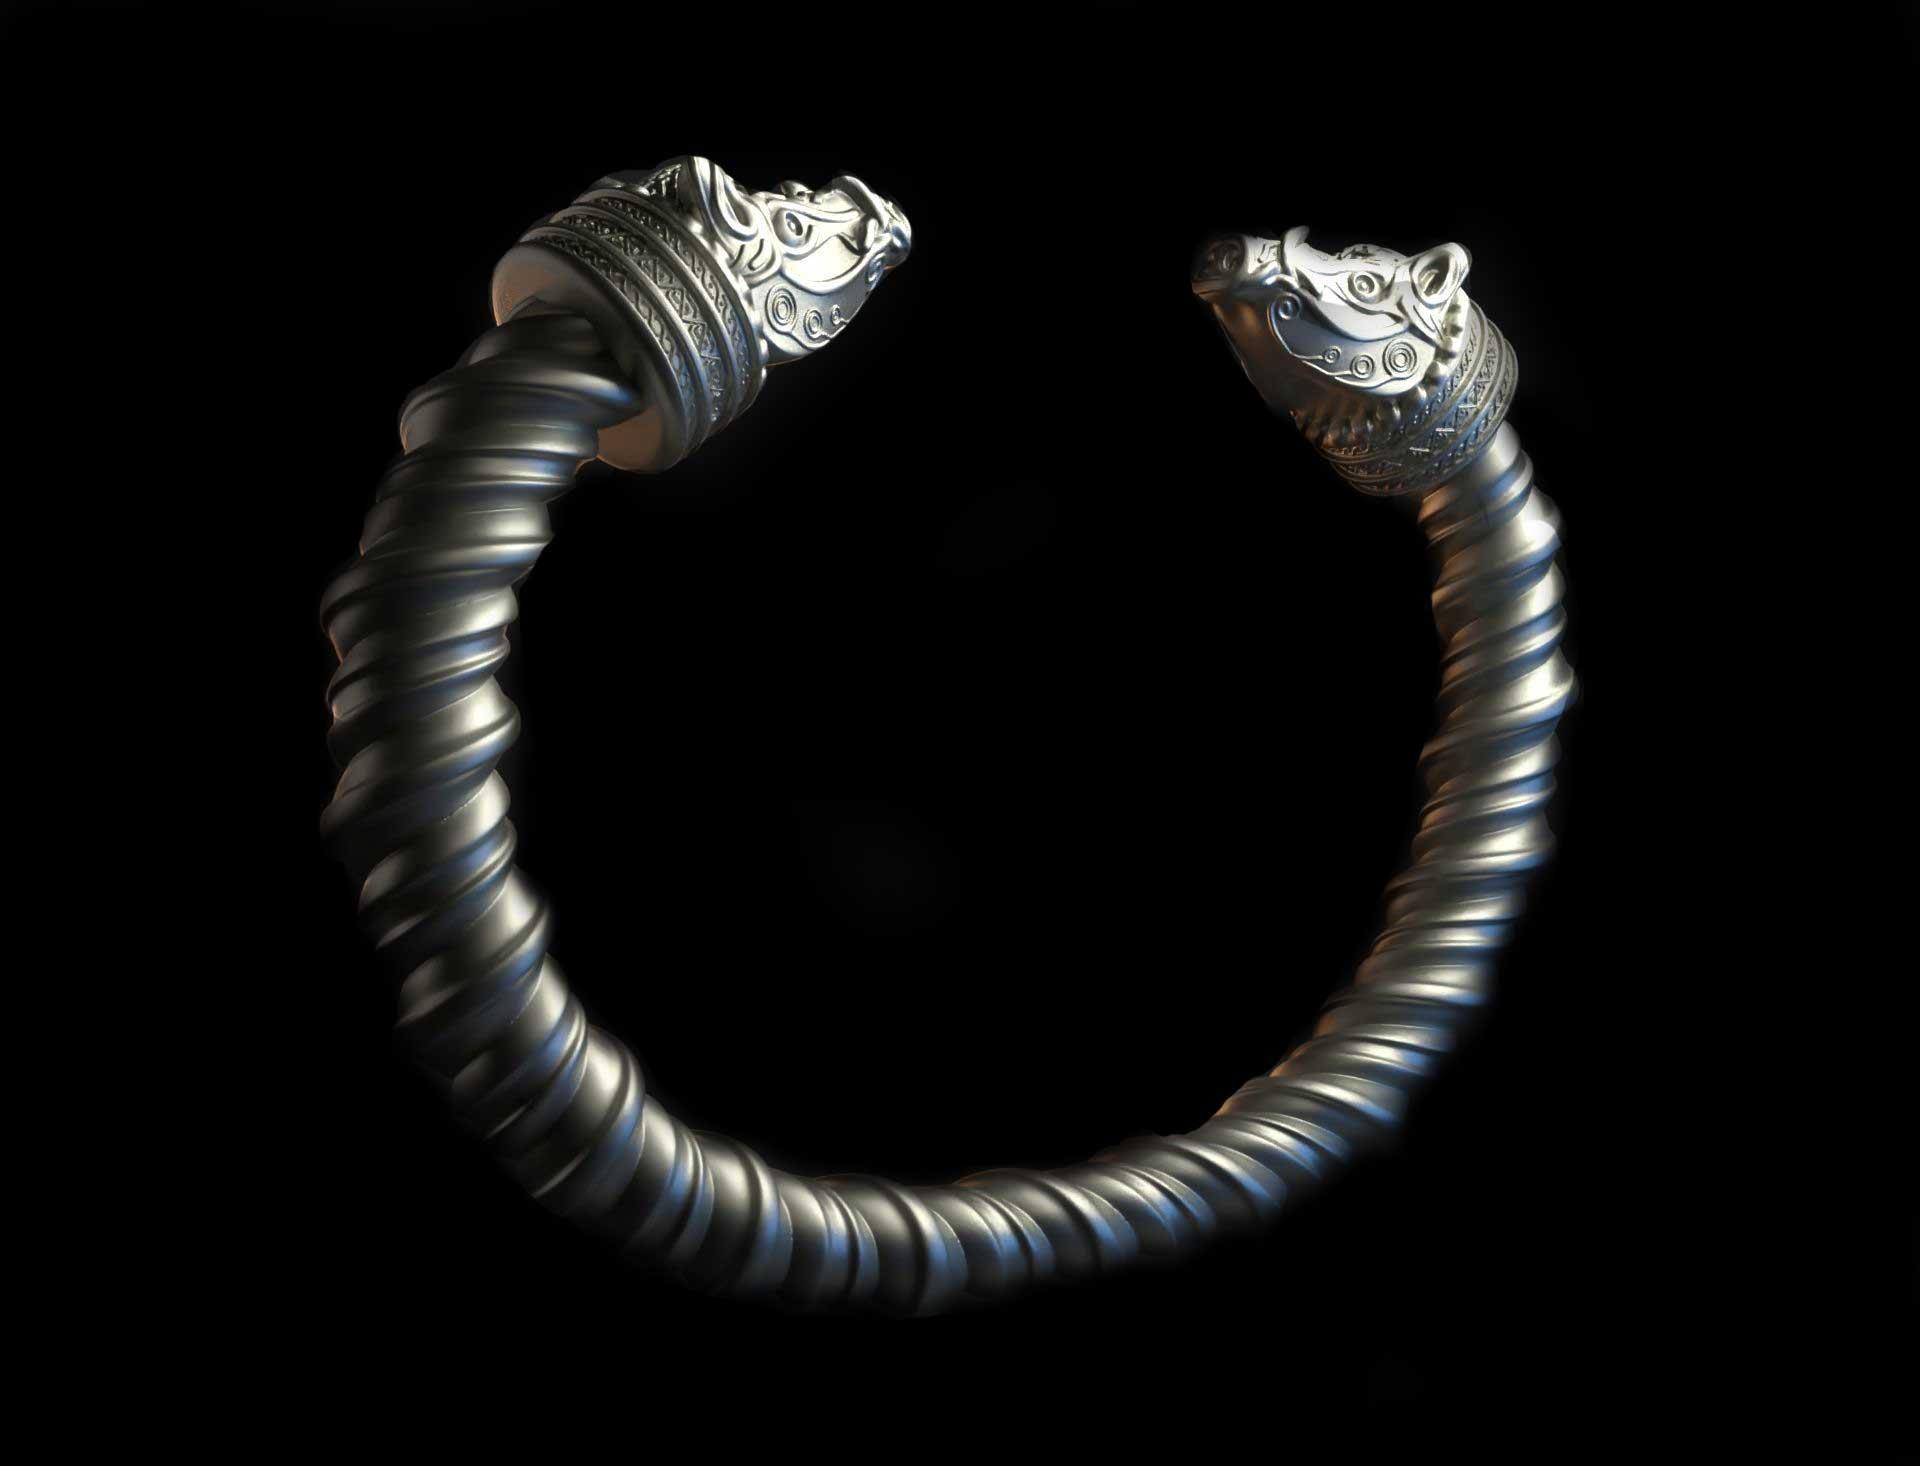 viking-wild-boar-bracelet-intended-for-3d-printing-3d-model-obj-fbx-stl-blend-ztl-(1)